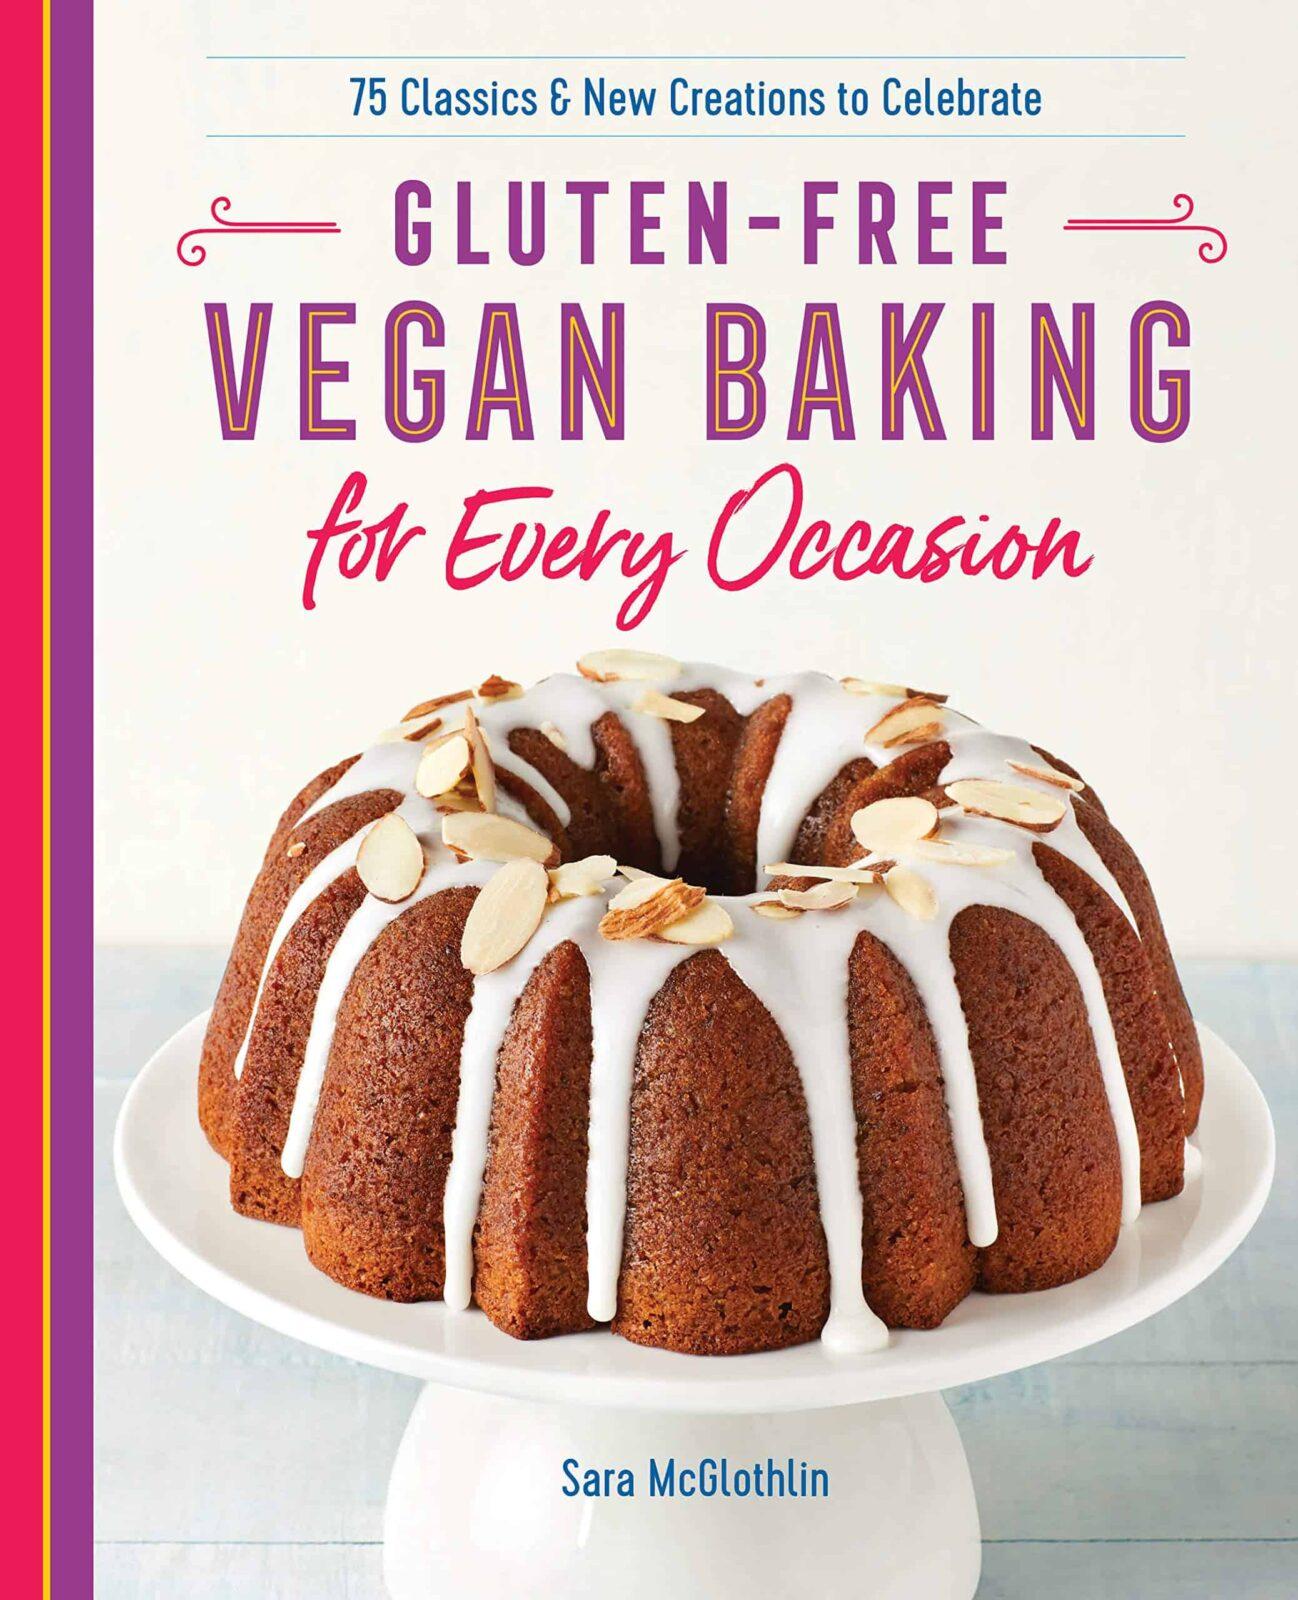 vegan baking cookbook